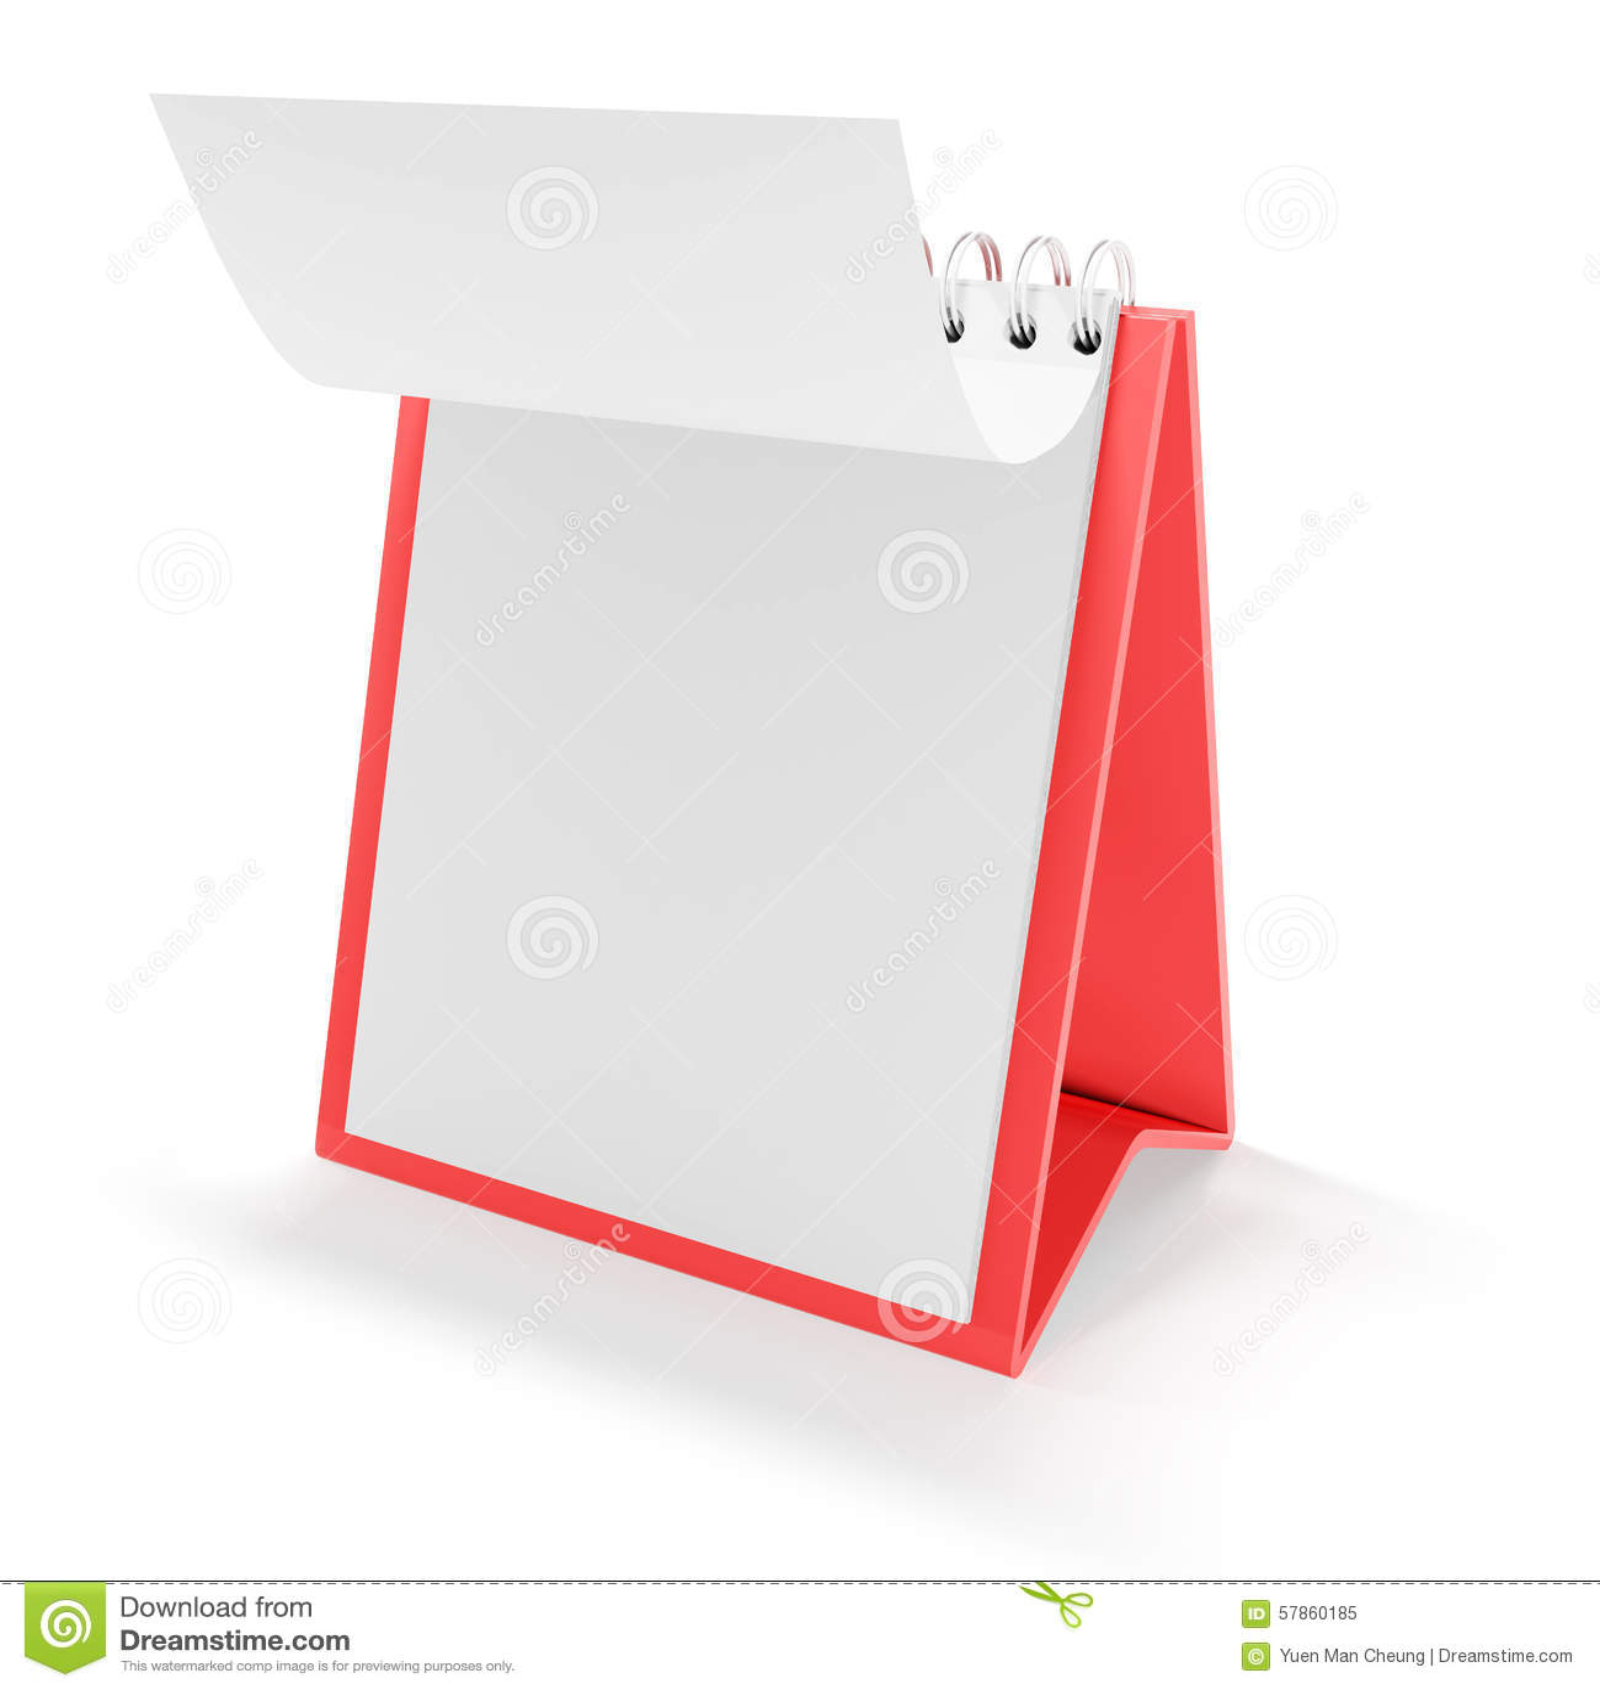 Blank Flip Calendar Clip Art blank calendar stock illustration - image ...